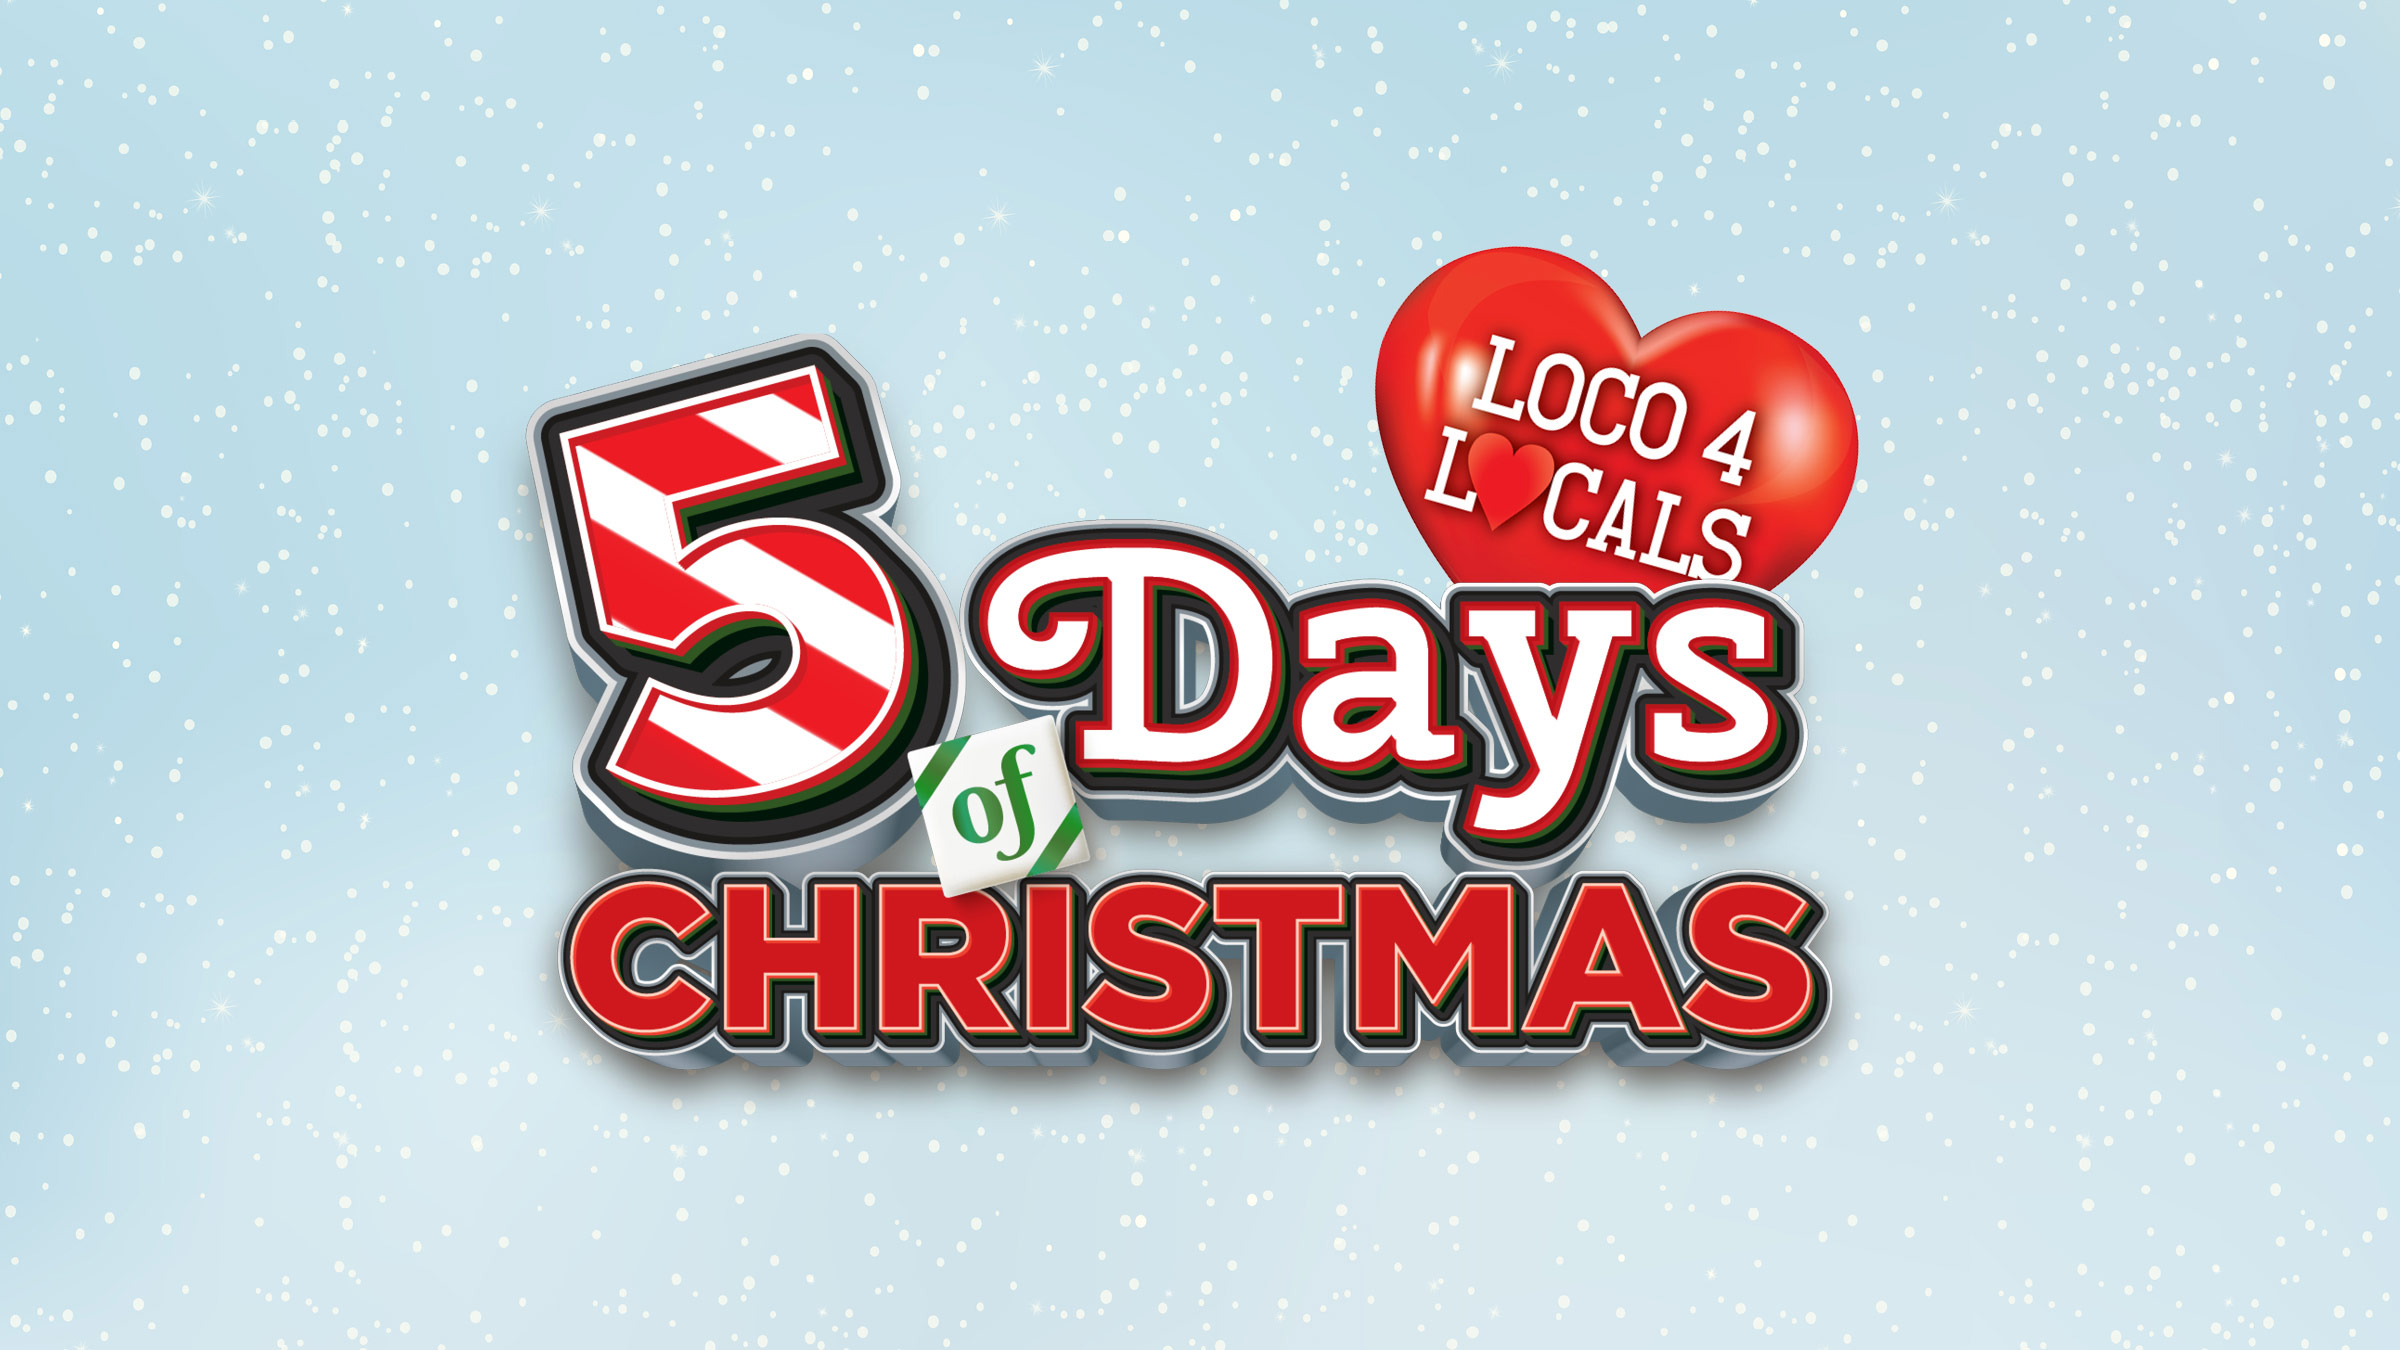 Loco 4 Locals - 5 Days of Christmas